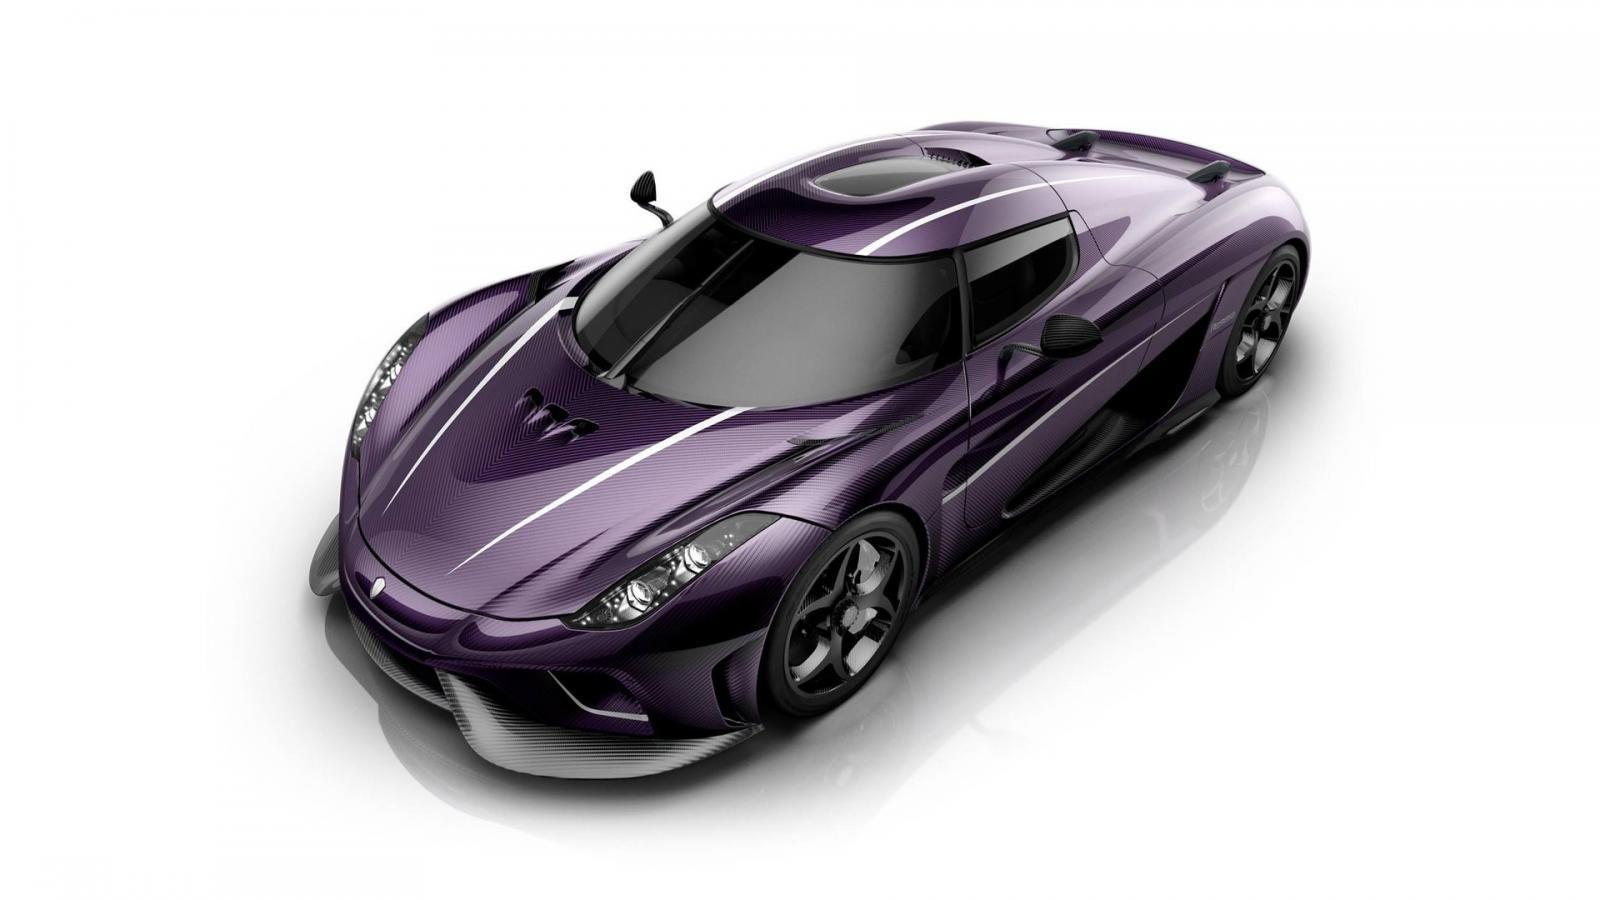 Koenigsegg представила особую версию суперкара Regera, названную Purple Rain